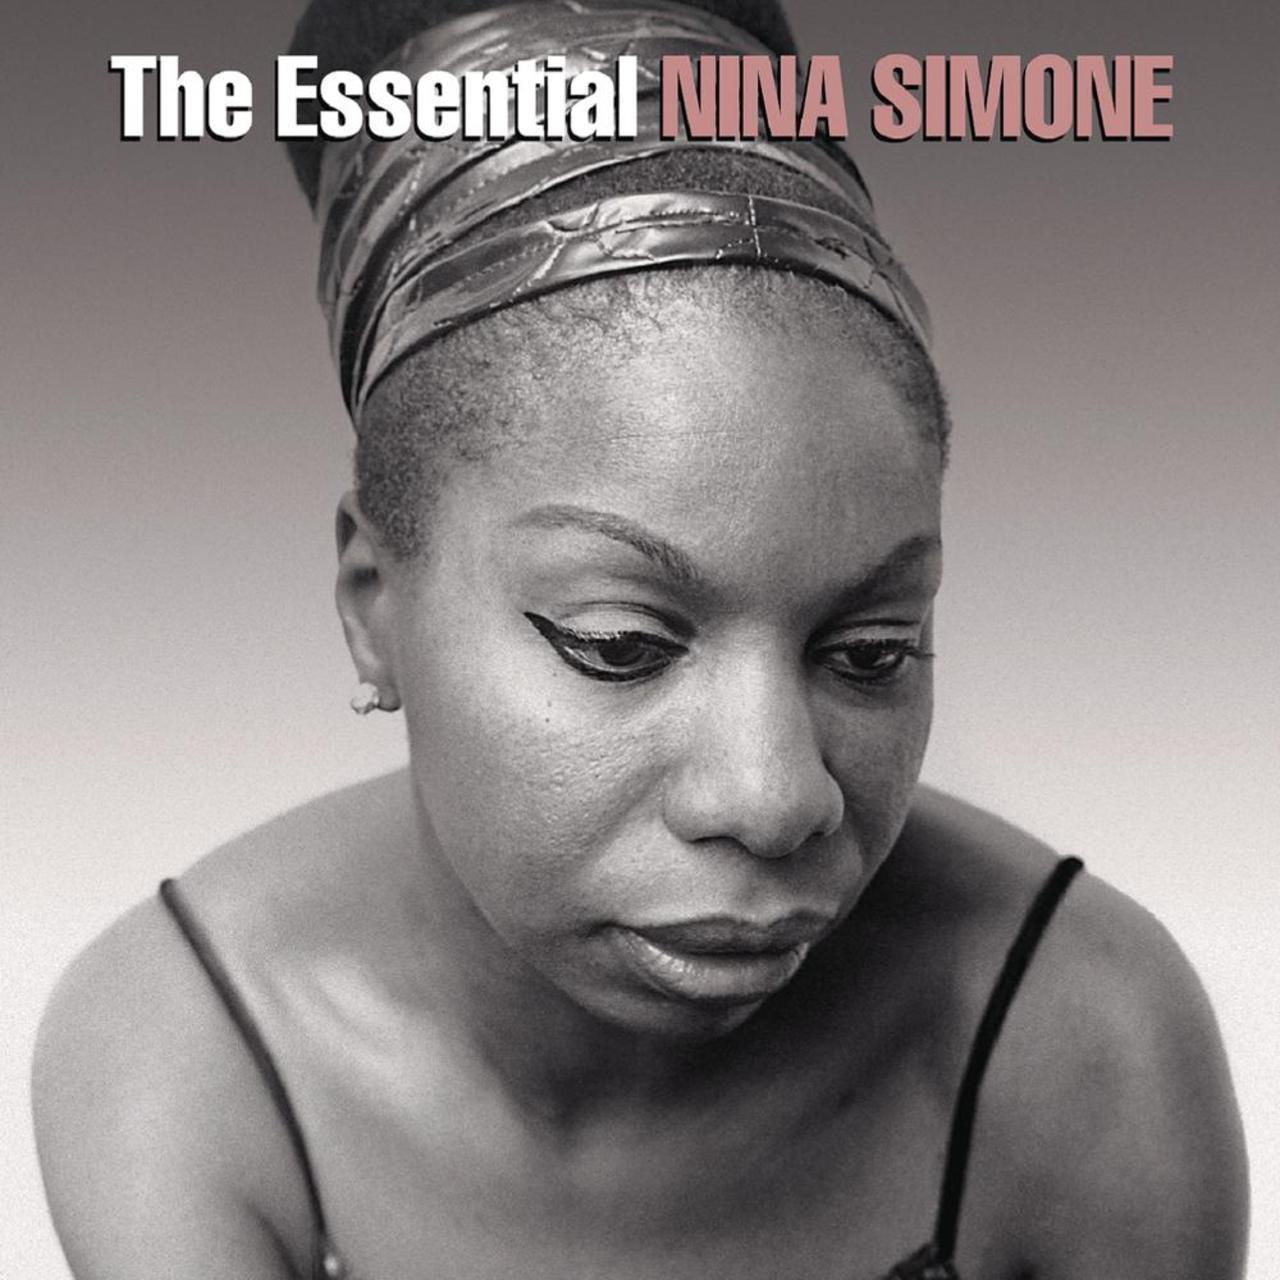 Nina simone greatest hits torrent download